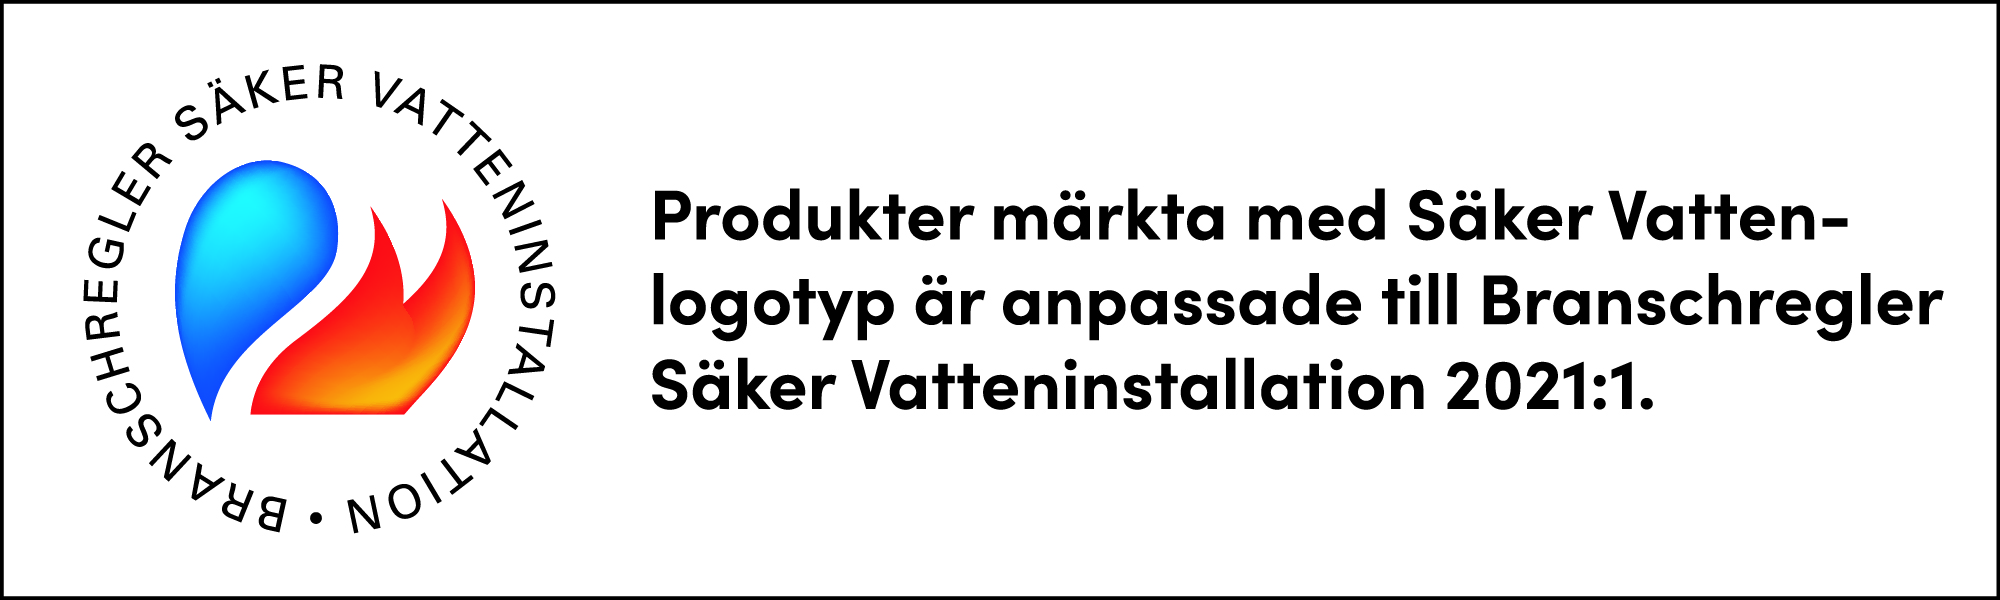 https://joramark.fi/wp-content/uploads/2021/10/Saker-Vatten-leverantorslogotyp-2021-alt-3-markta-produkter.jpg